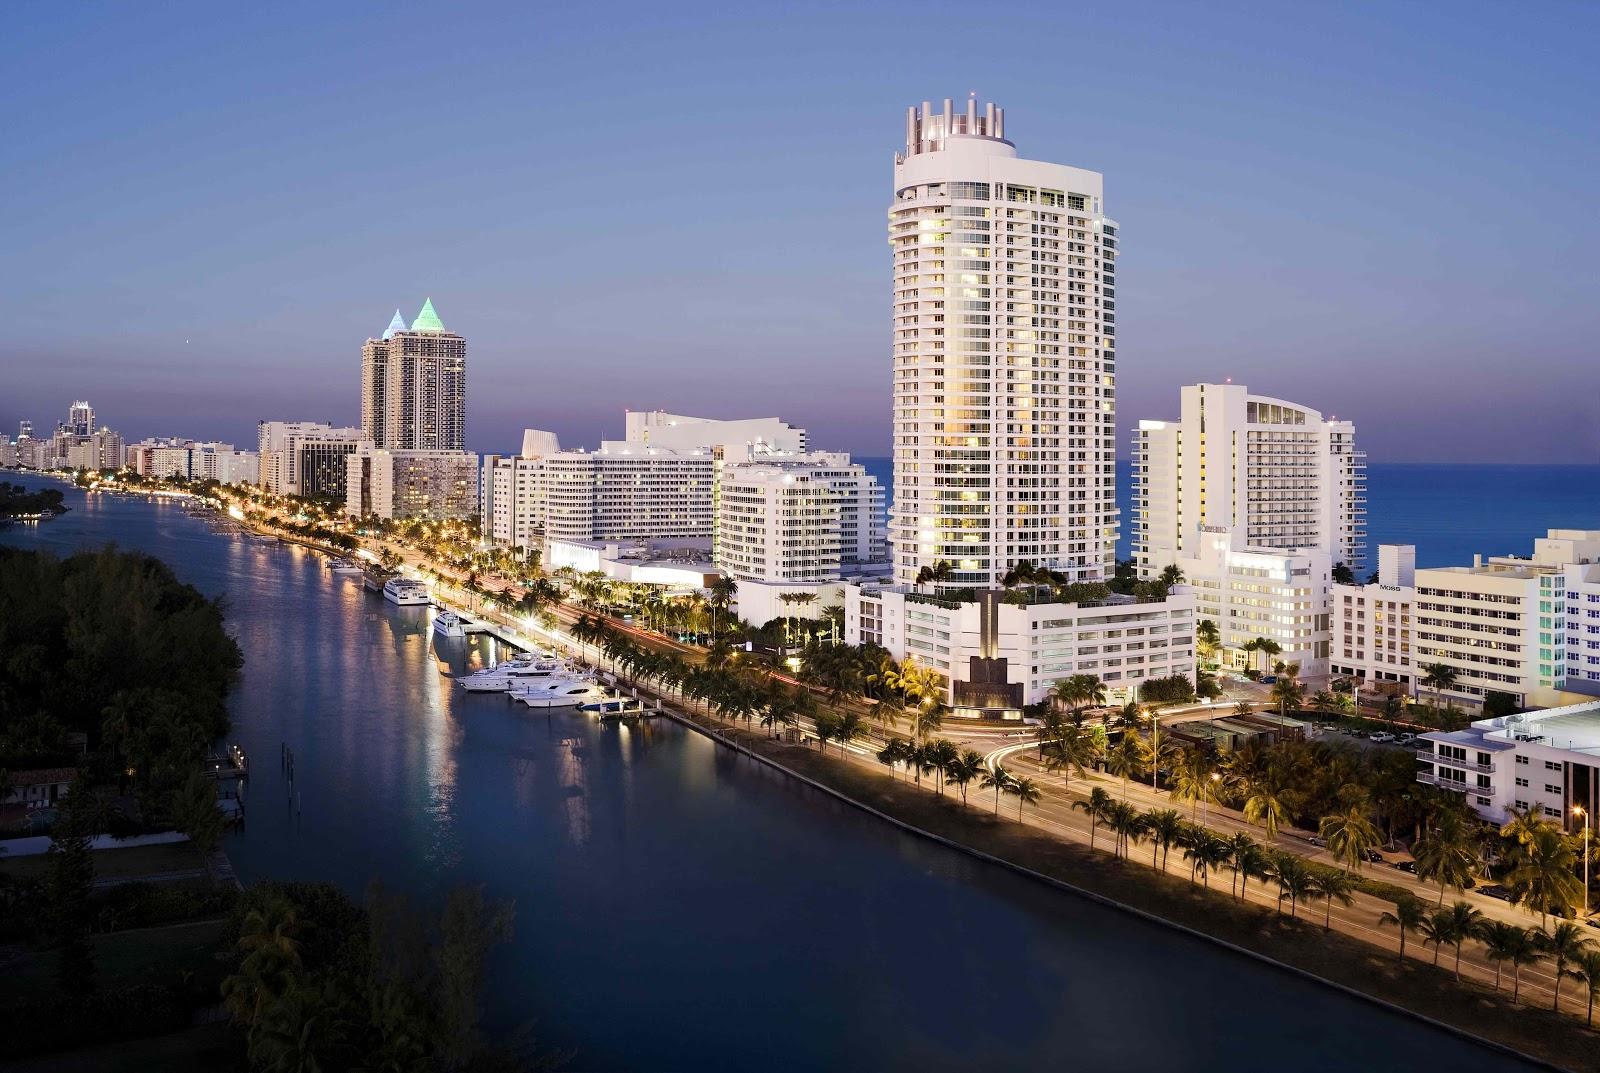 North Miami Beach Millionaires Row